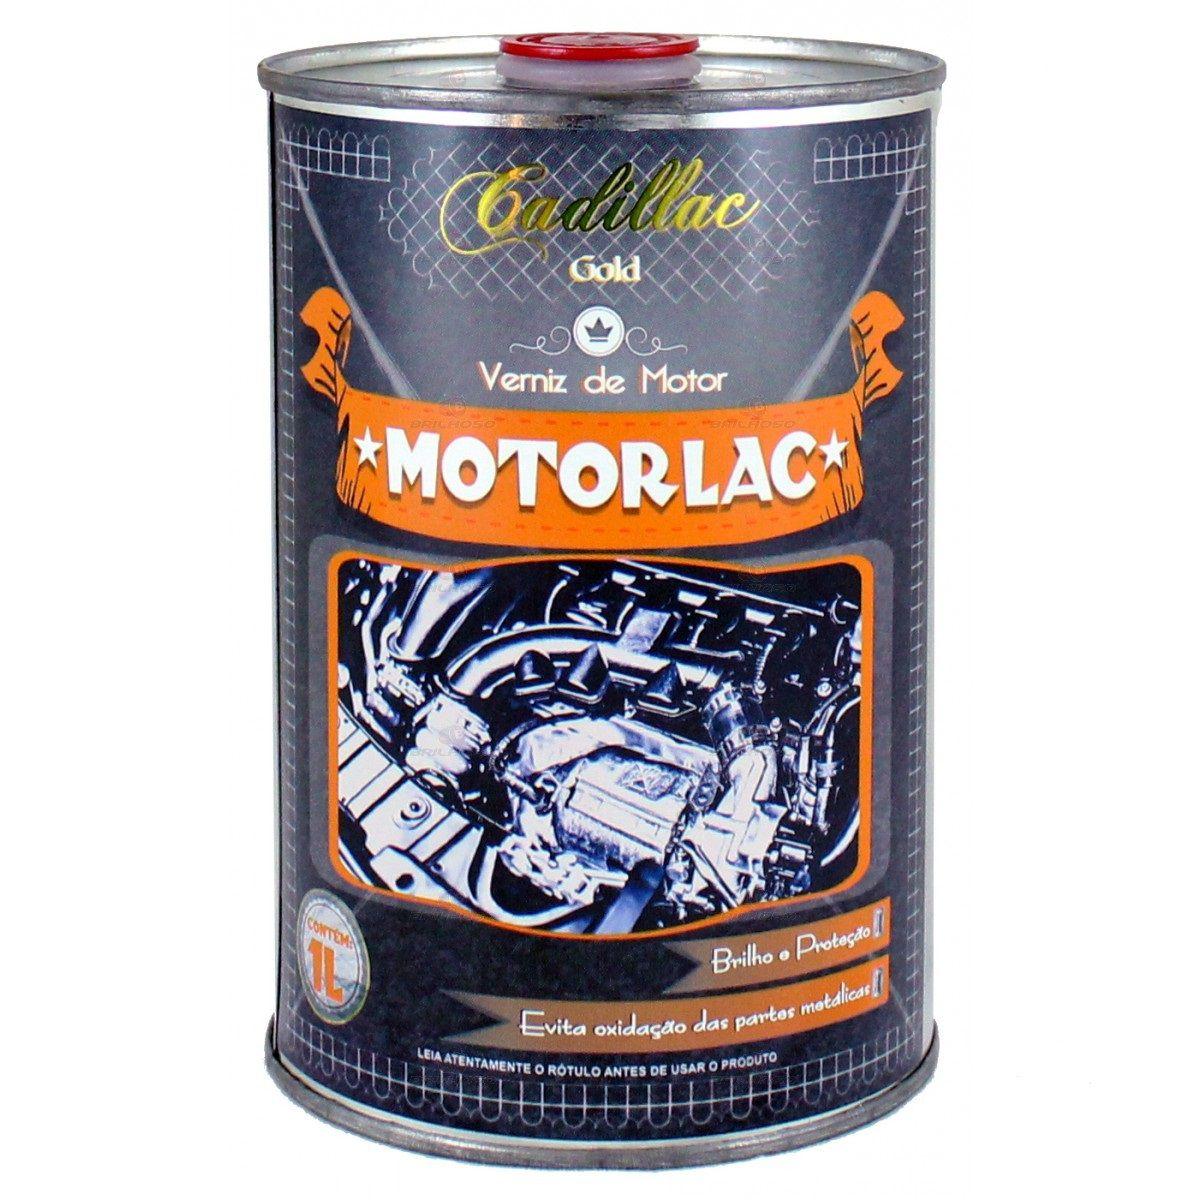 VERNIZ DE MOTOR MOTORLAC CADILLAC 1LT